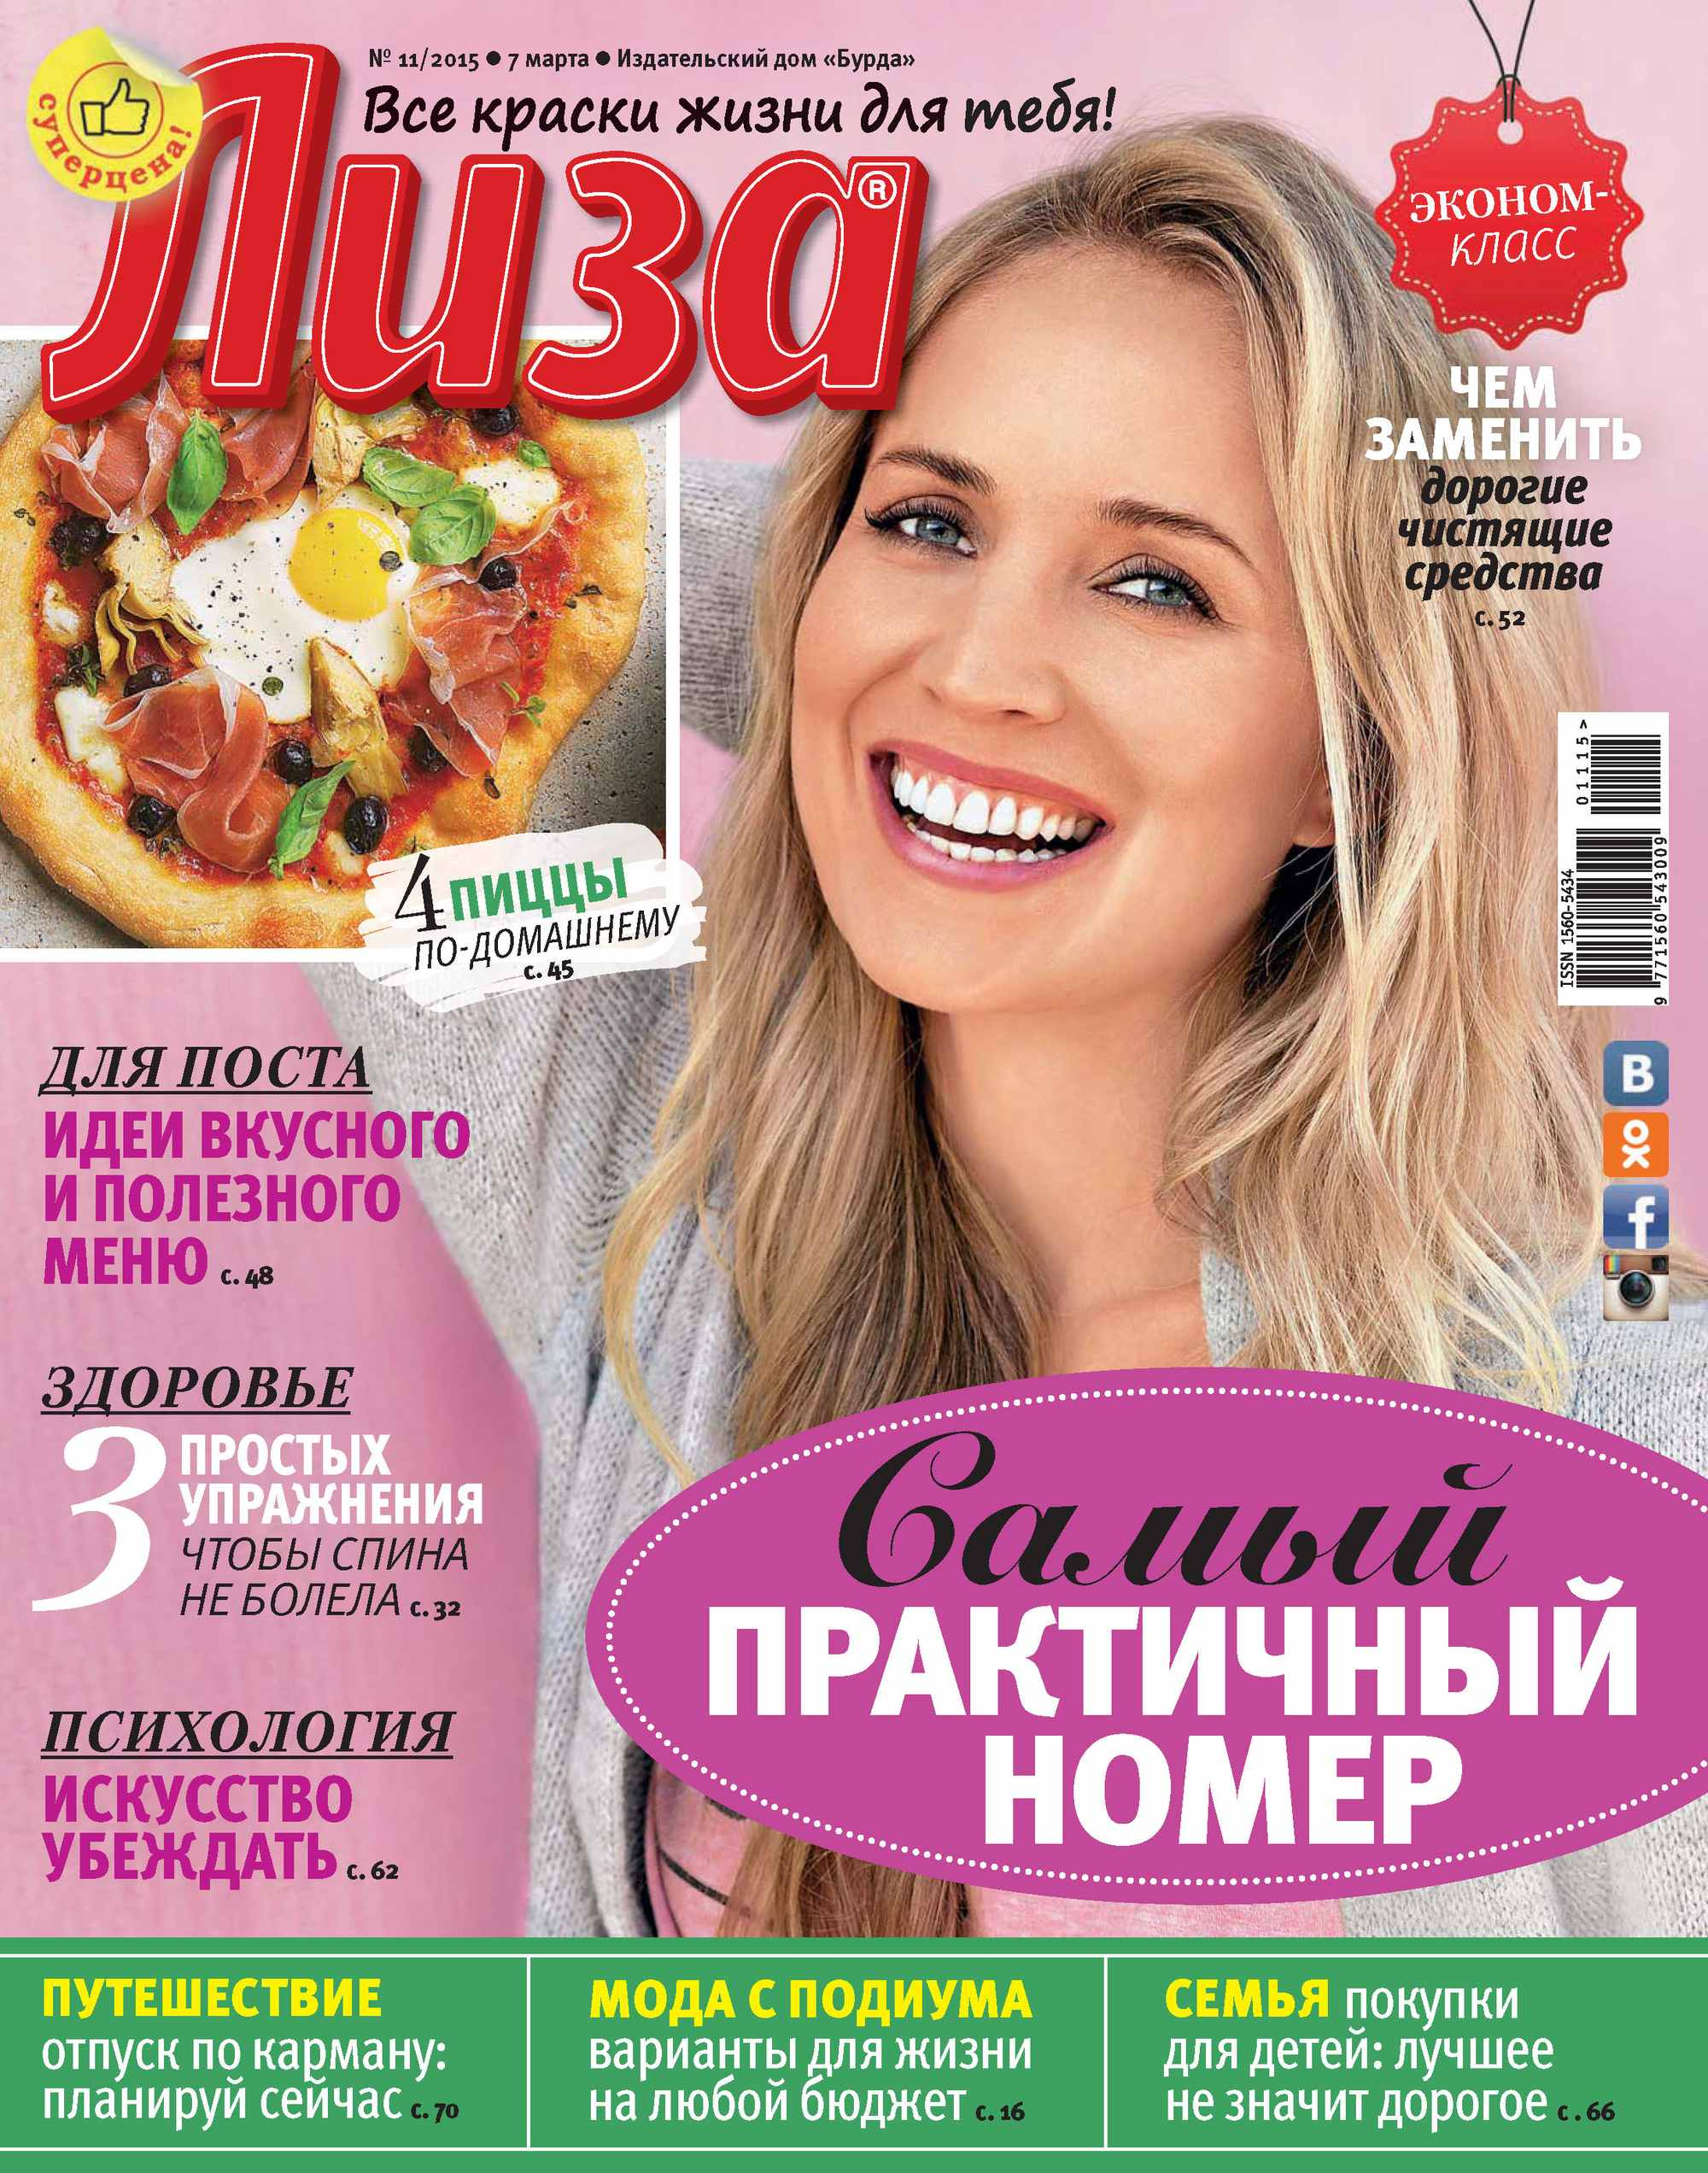 ИД «Бурда» Журнал «Лиза» №11/2015 ид бурда журнал лиза 22 2015